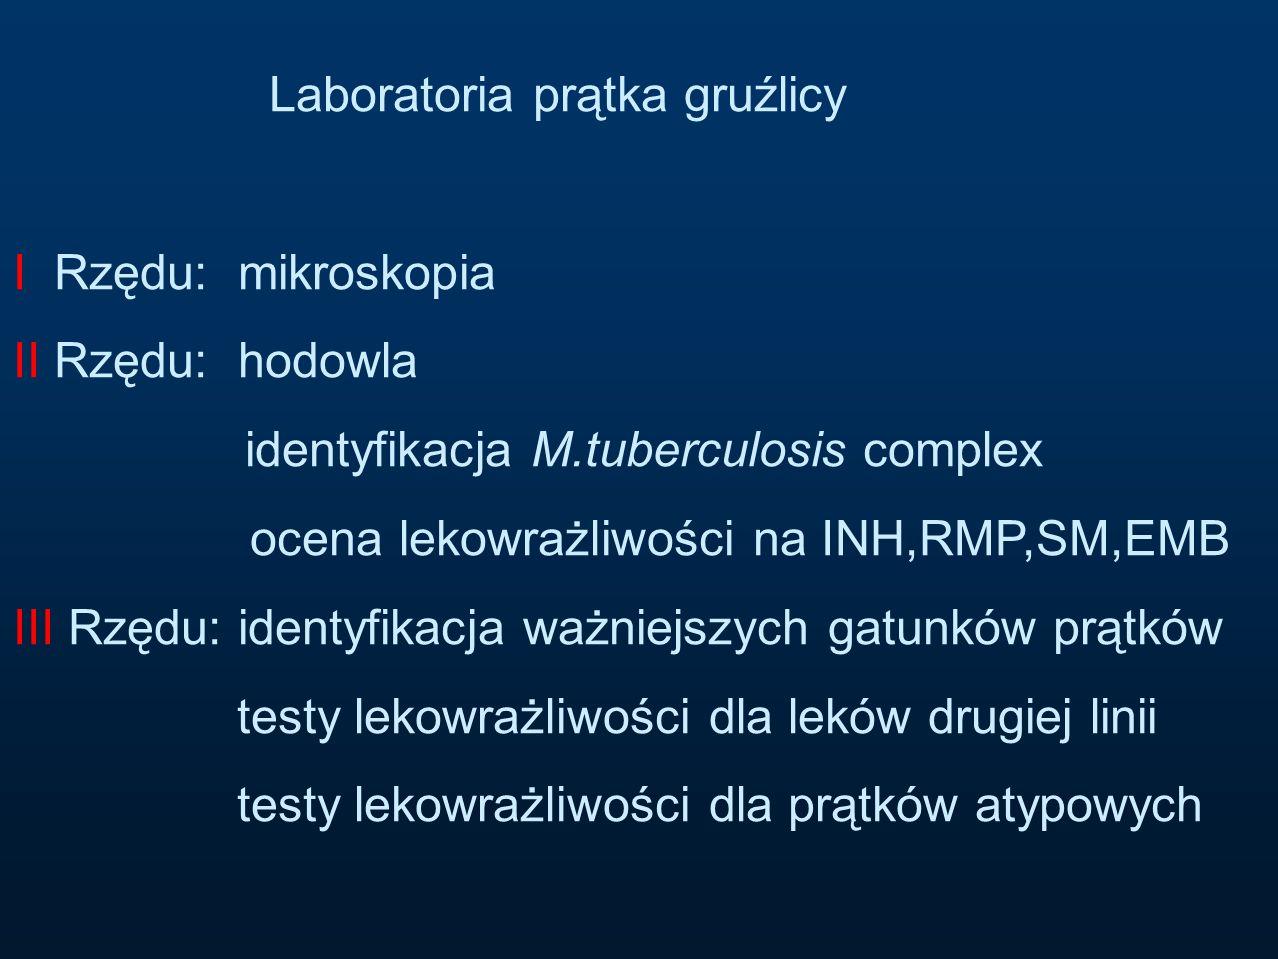 identyfikacja M.tuberculosis complex